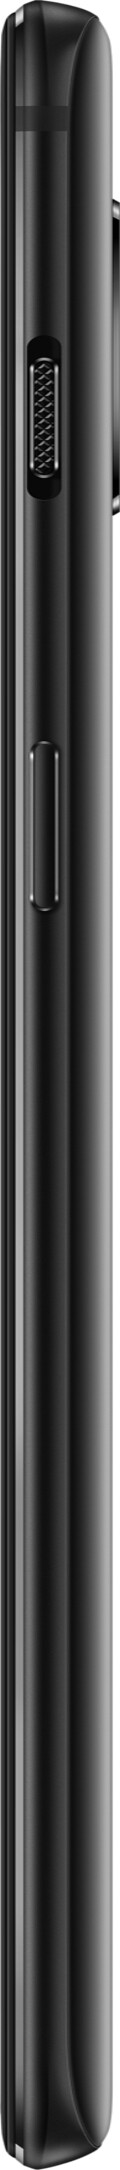 OnePlus 6T